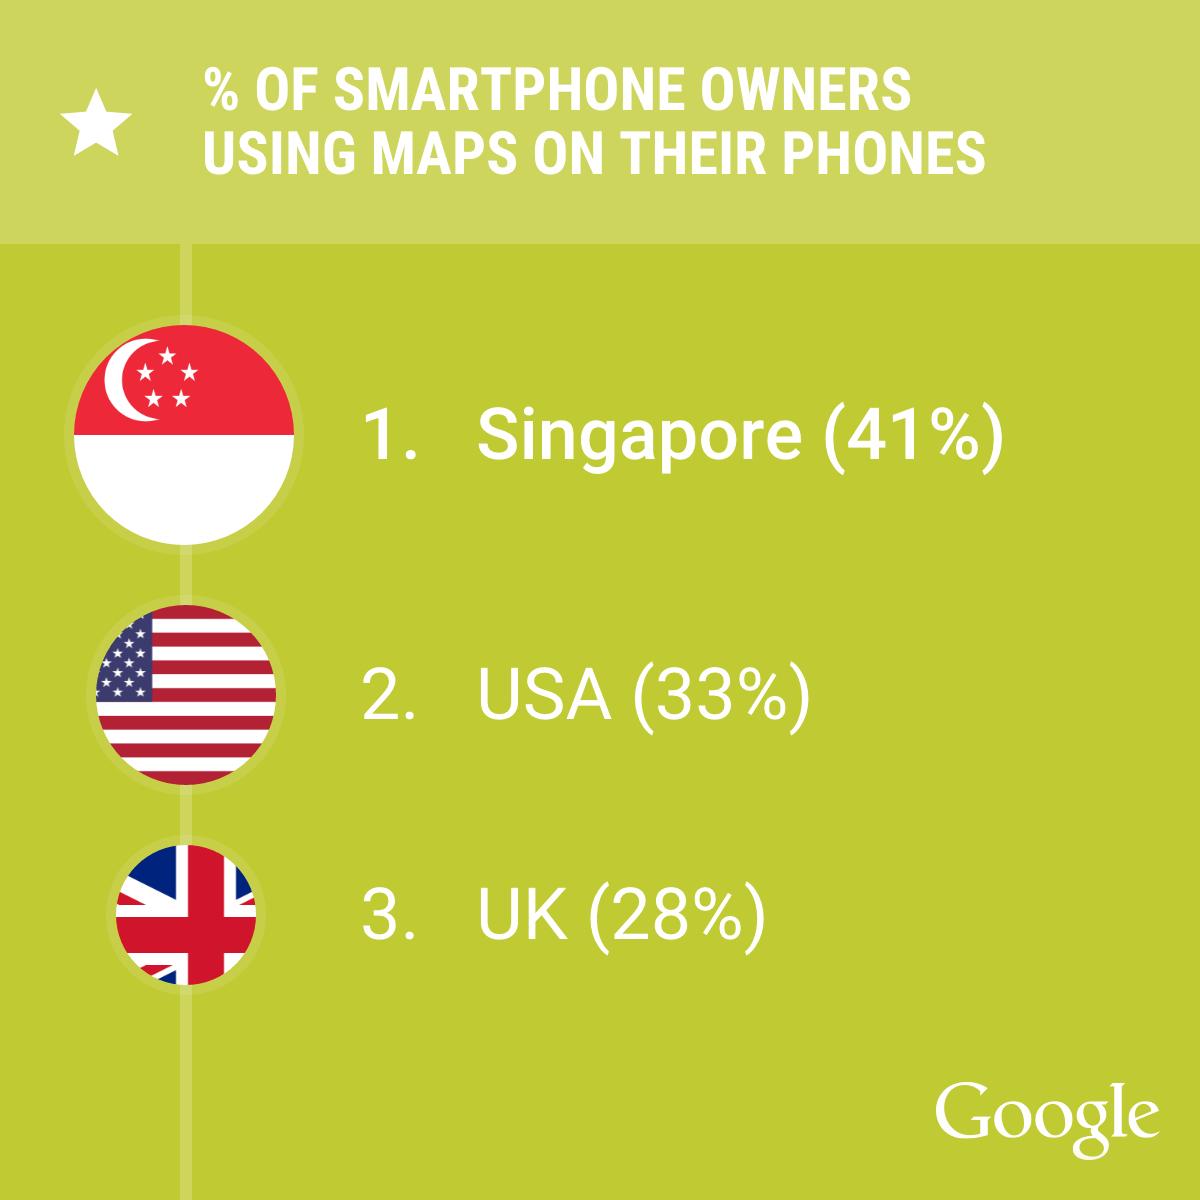 google-infographic (24).jpg